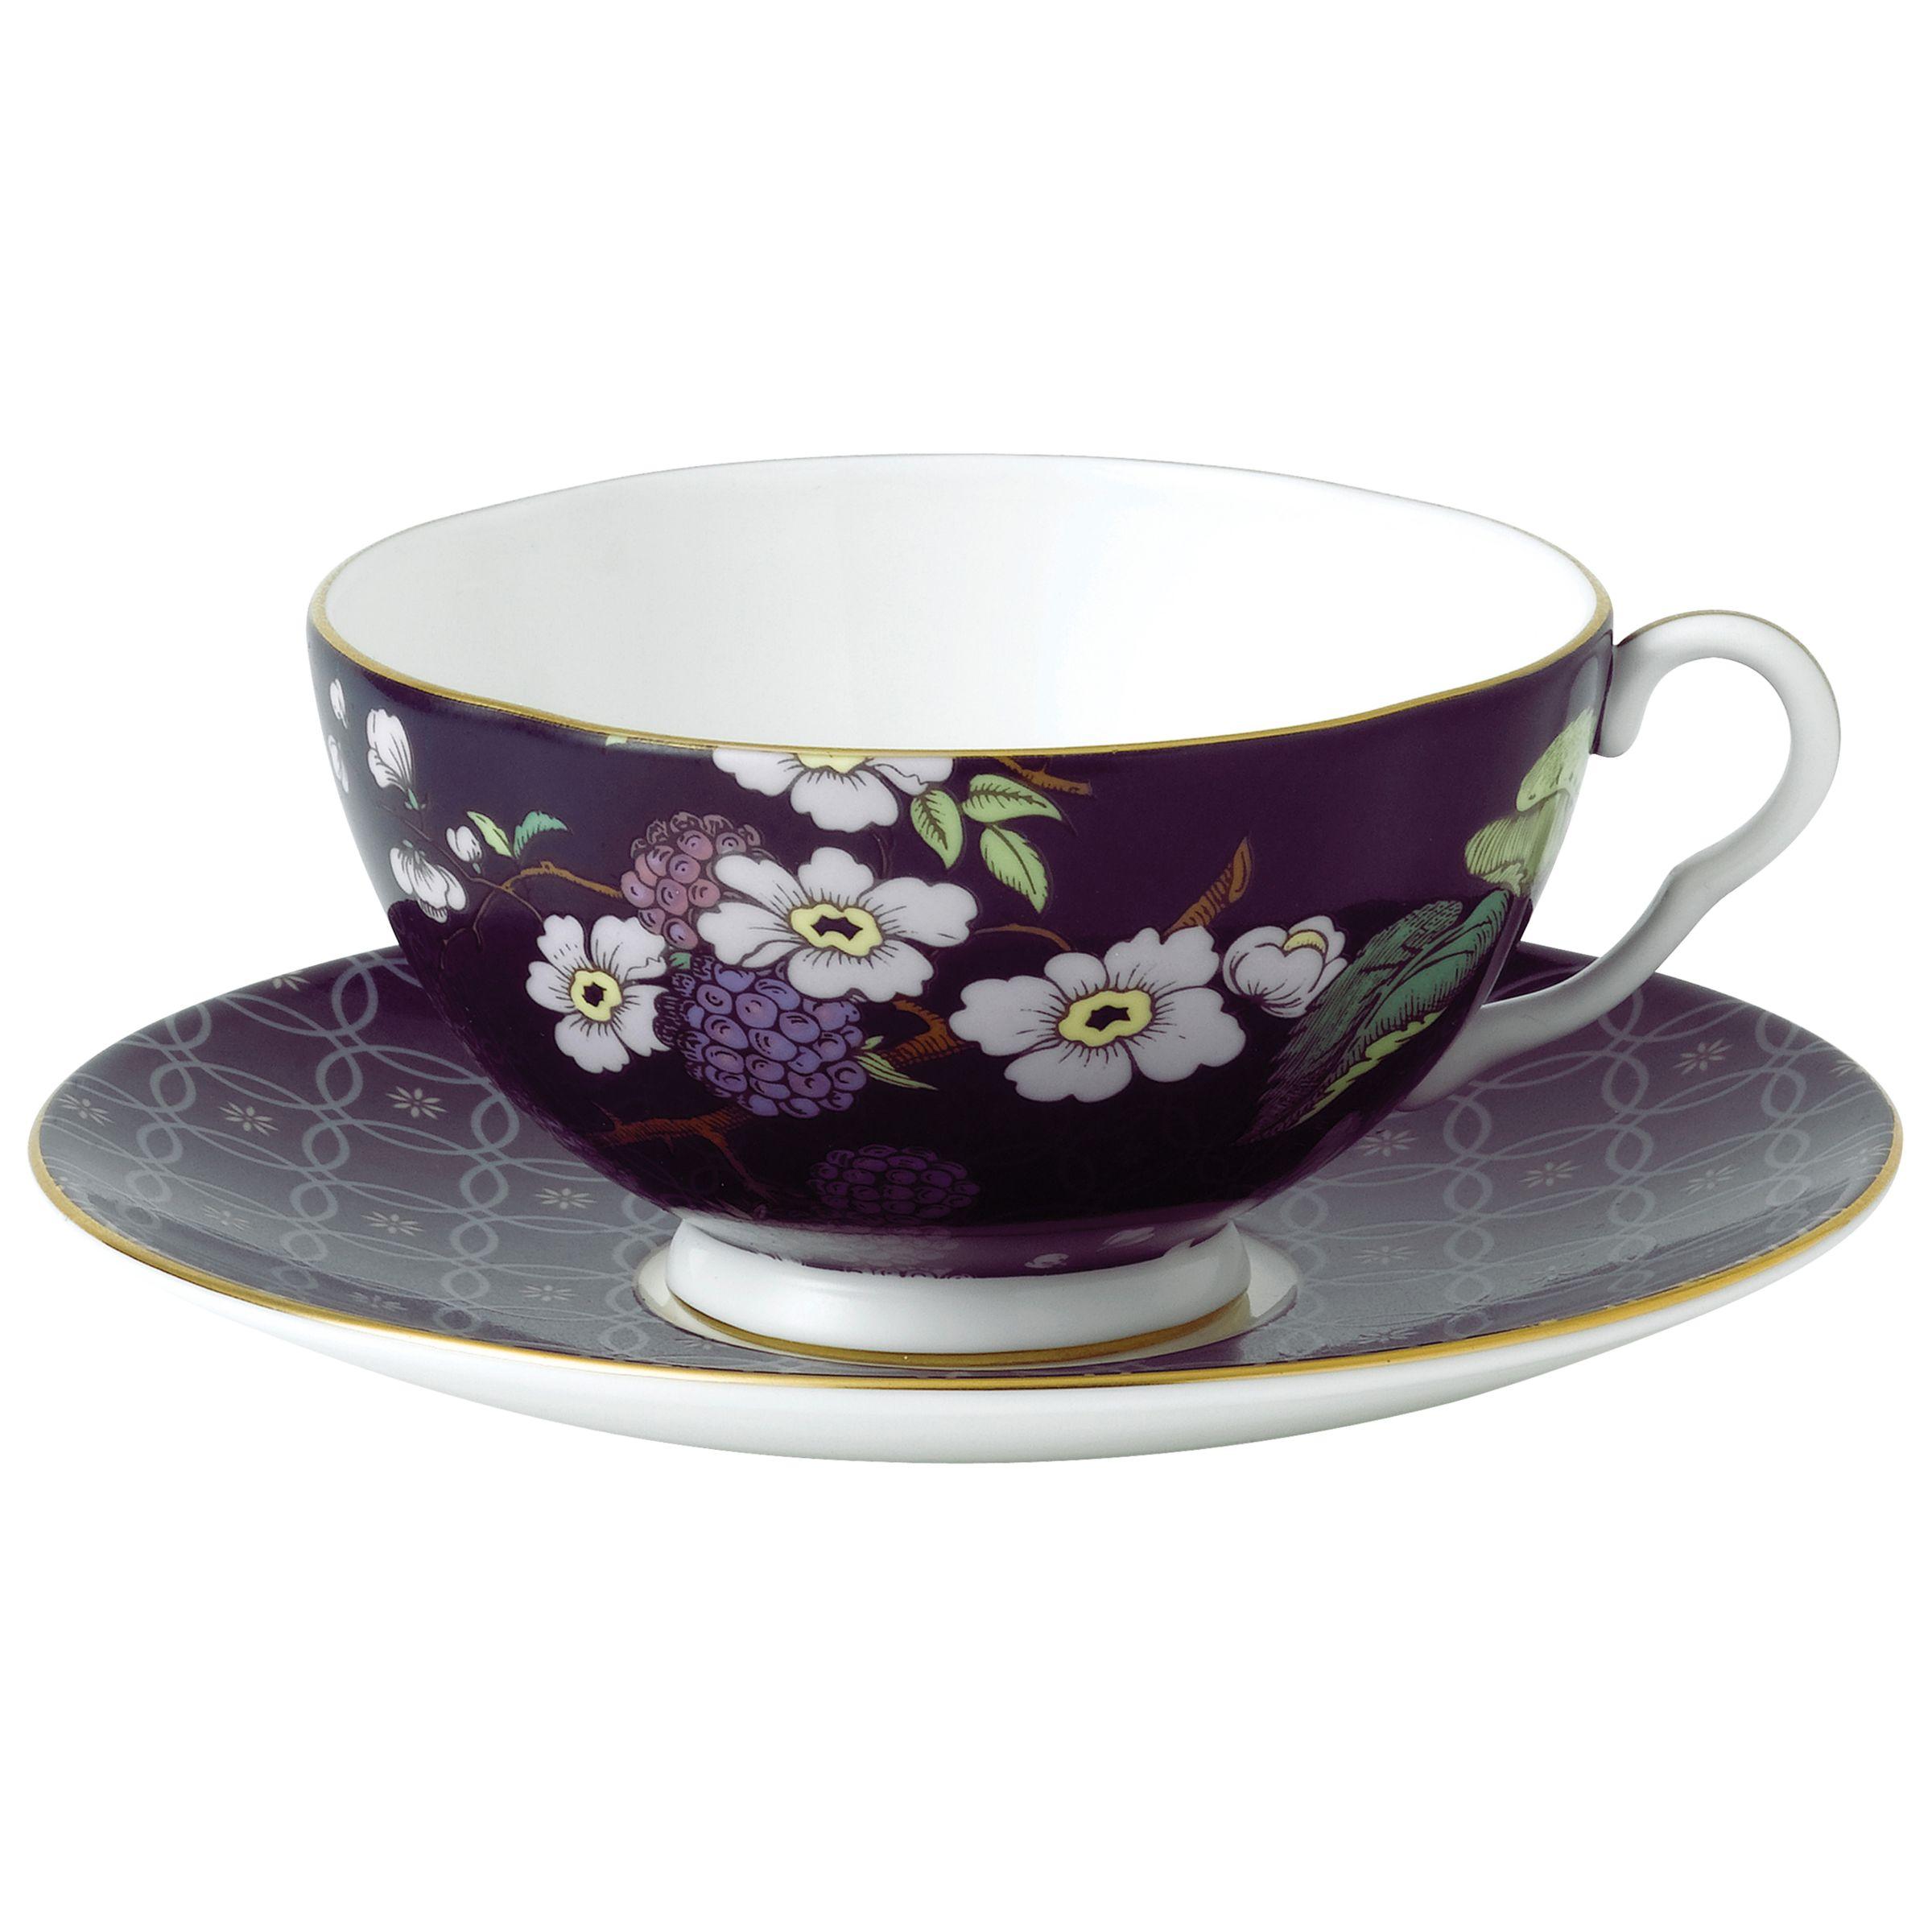 Wedgwood Wedgwood Tea Garden Blackberry Teacup & Saucer